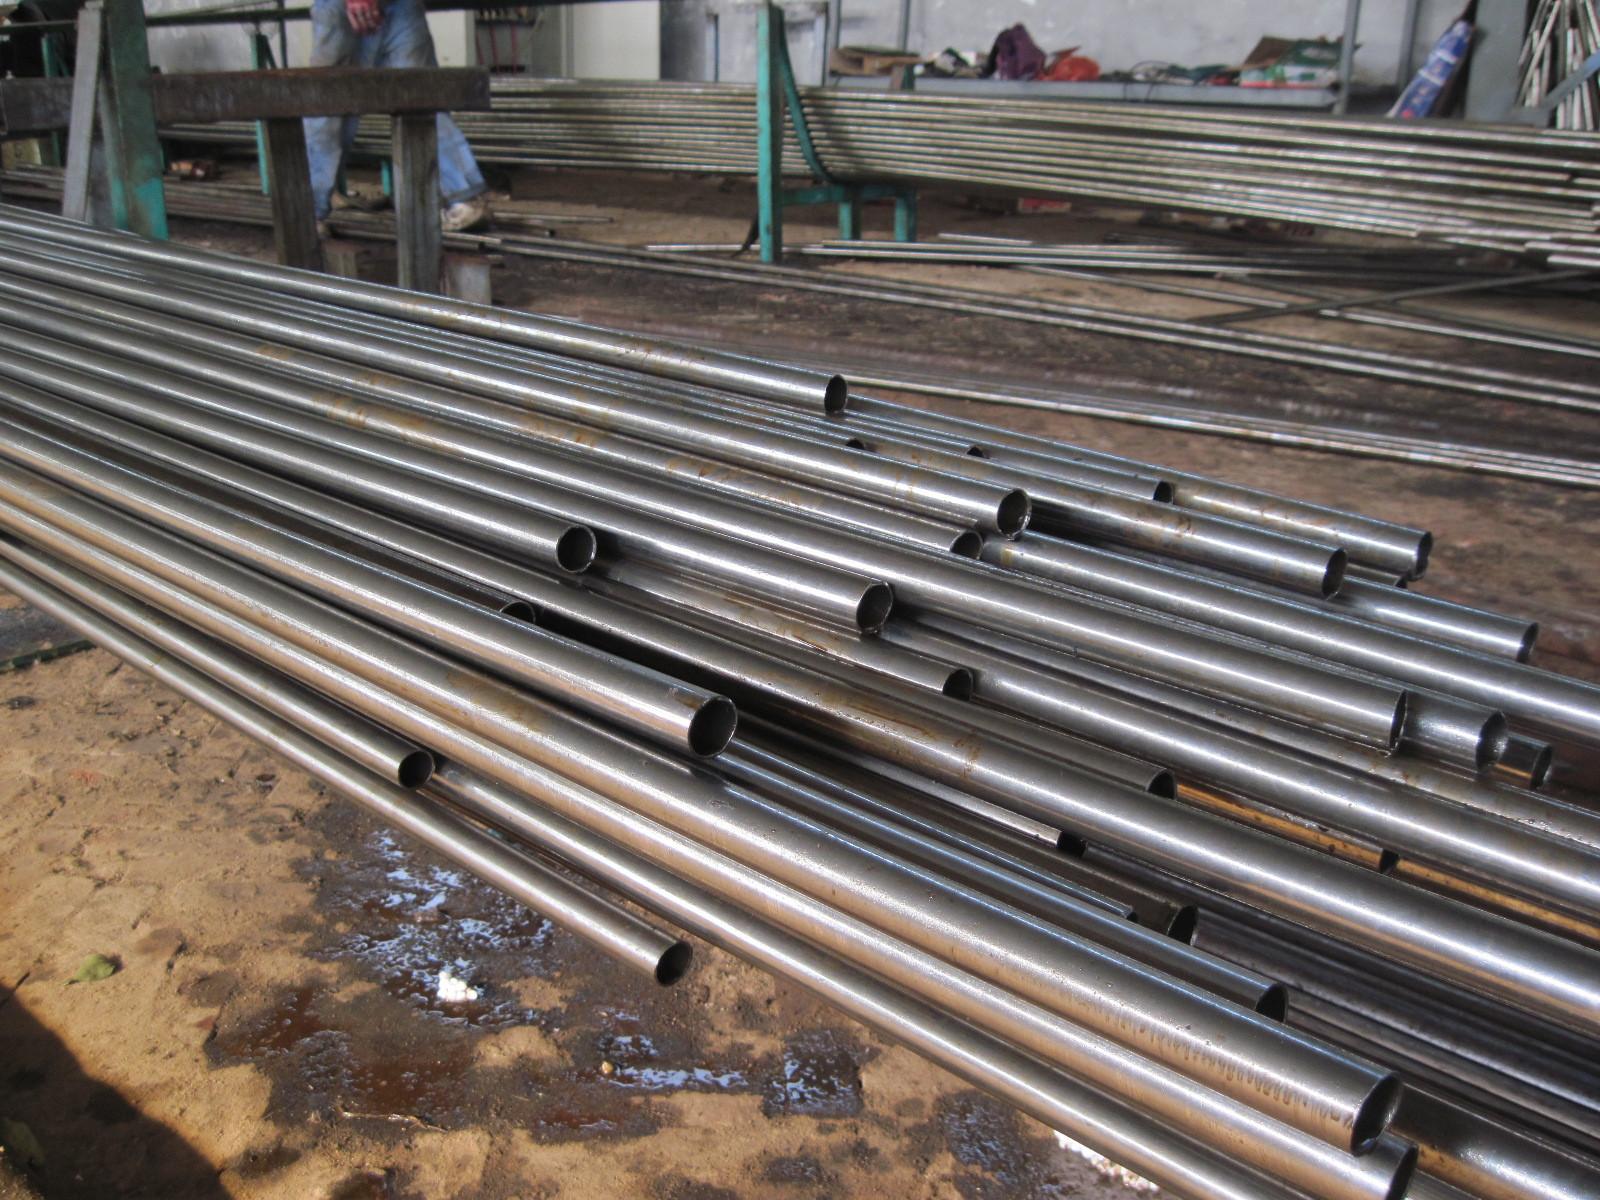 DZ55石油套管企业-16mn无缝方矩管价格-聊城市睿创钢铁有限公司